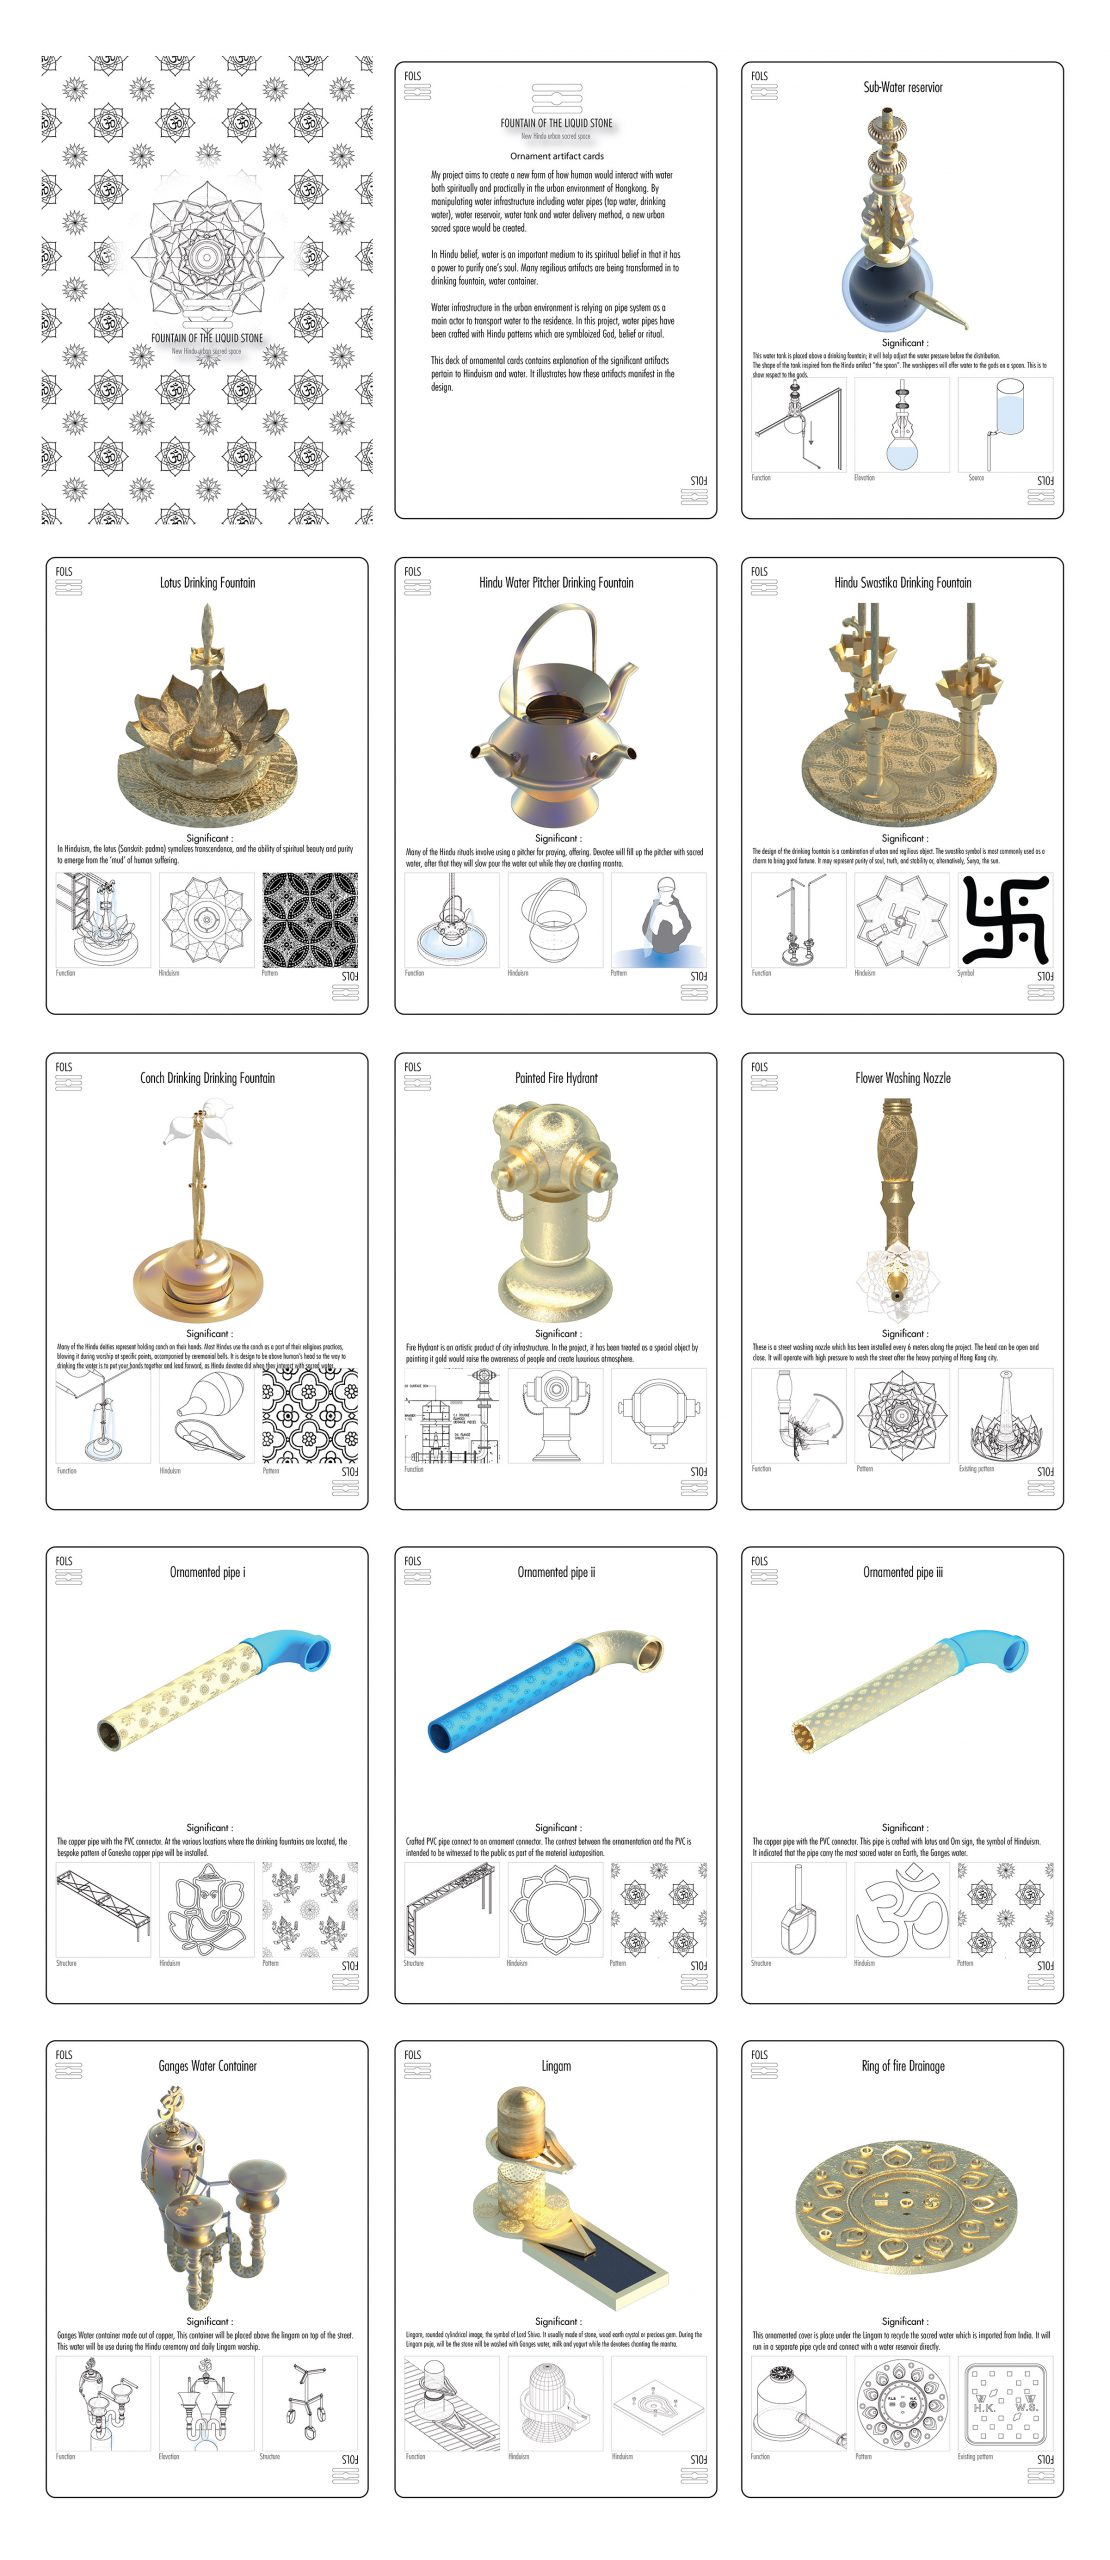 verasustudio_Fountain of the liquid stone_New Hindu Urban scared space_Pottinger Street, Hongkong_ornamental cards